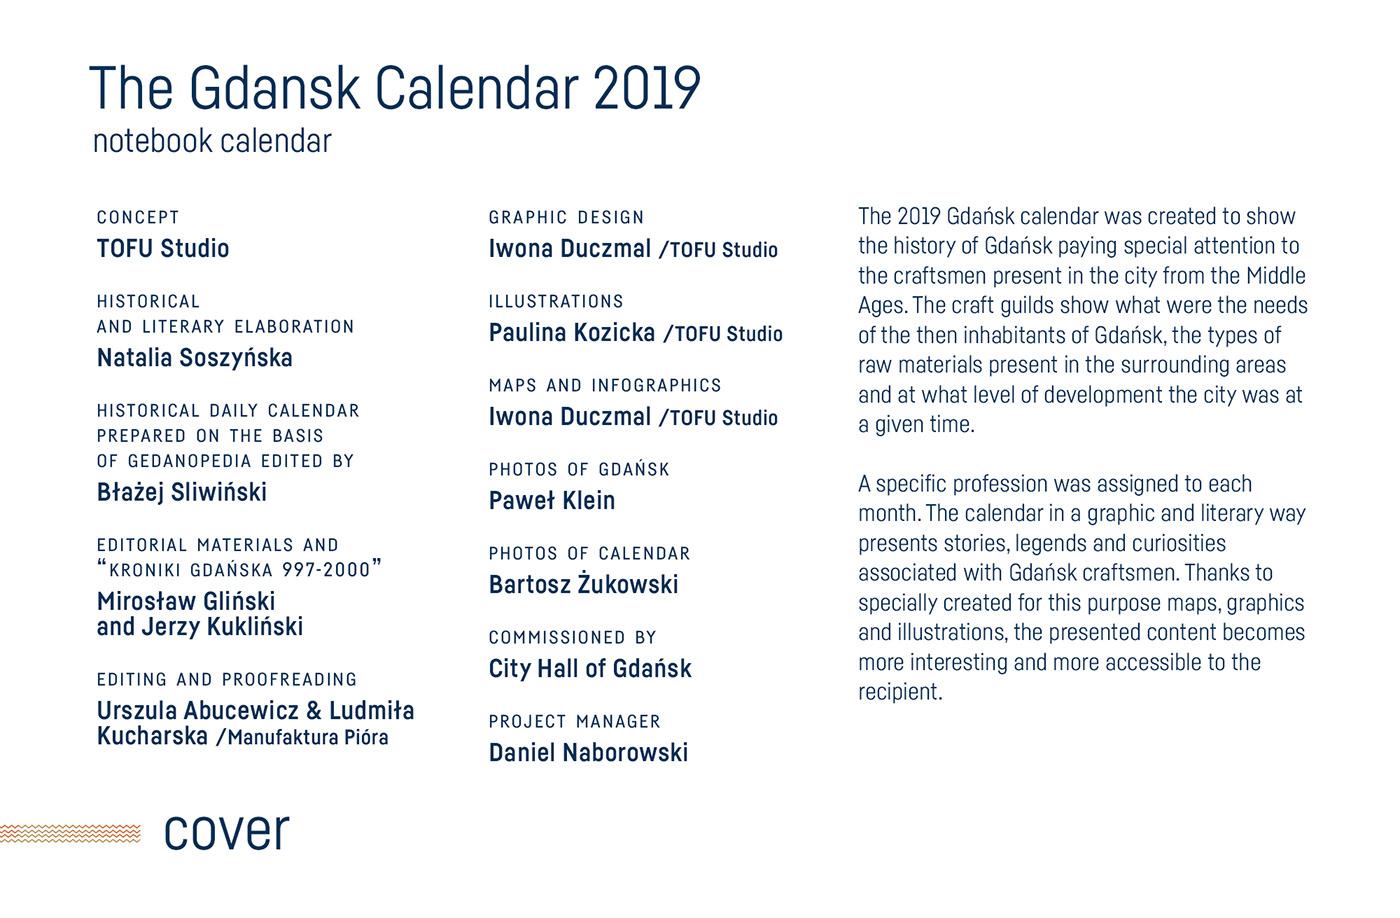 The Gdansk Calendar 2019 on Behance